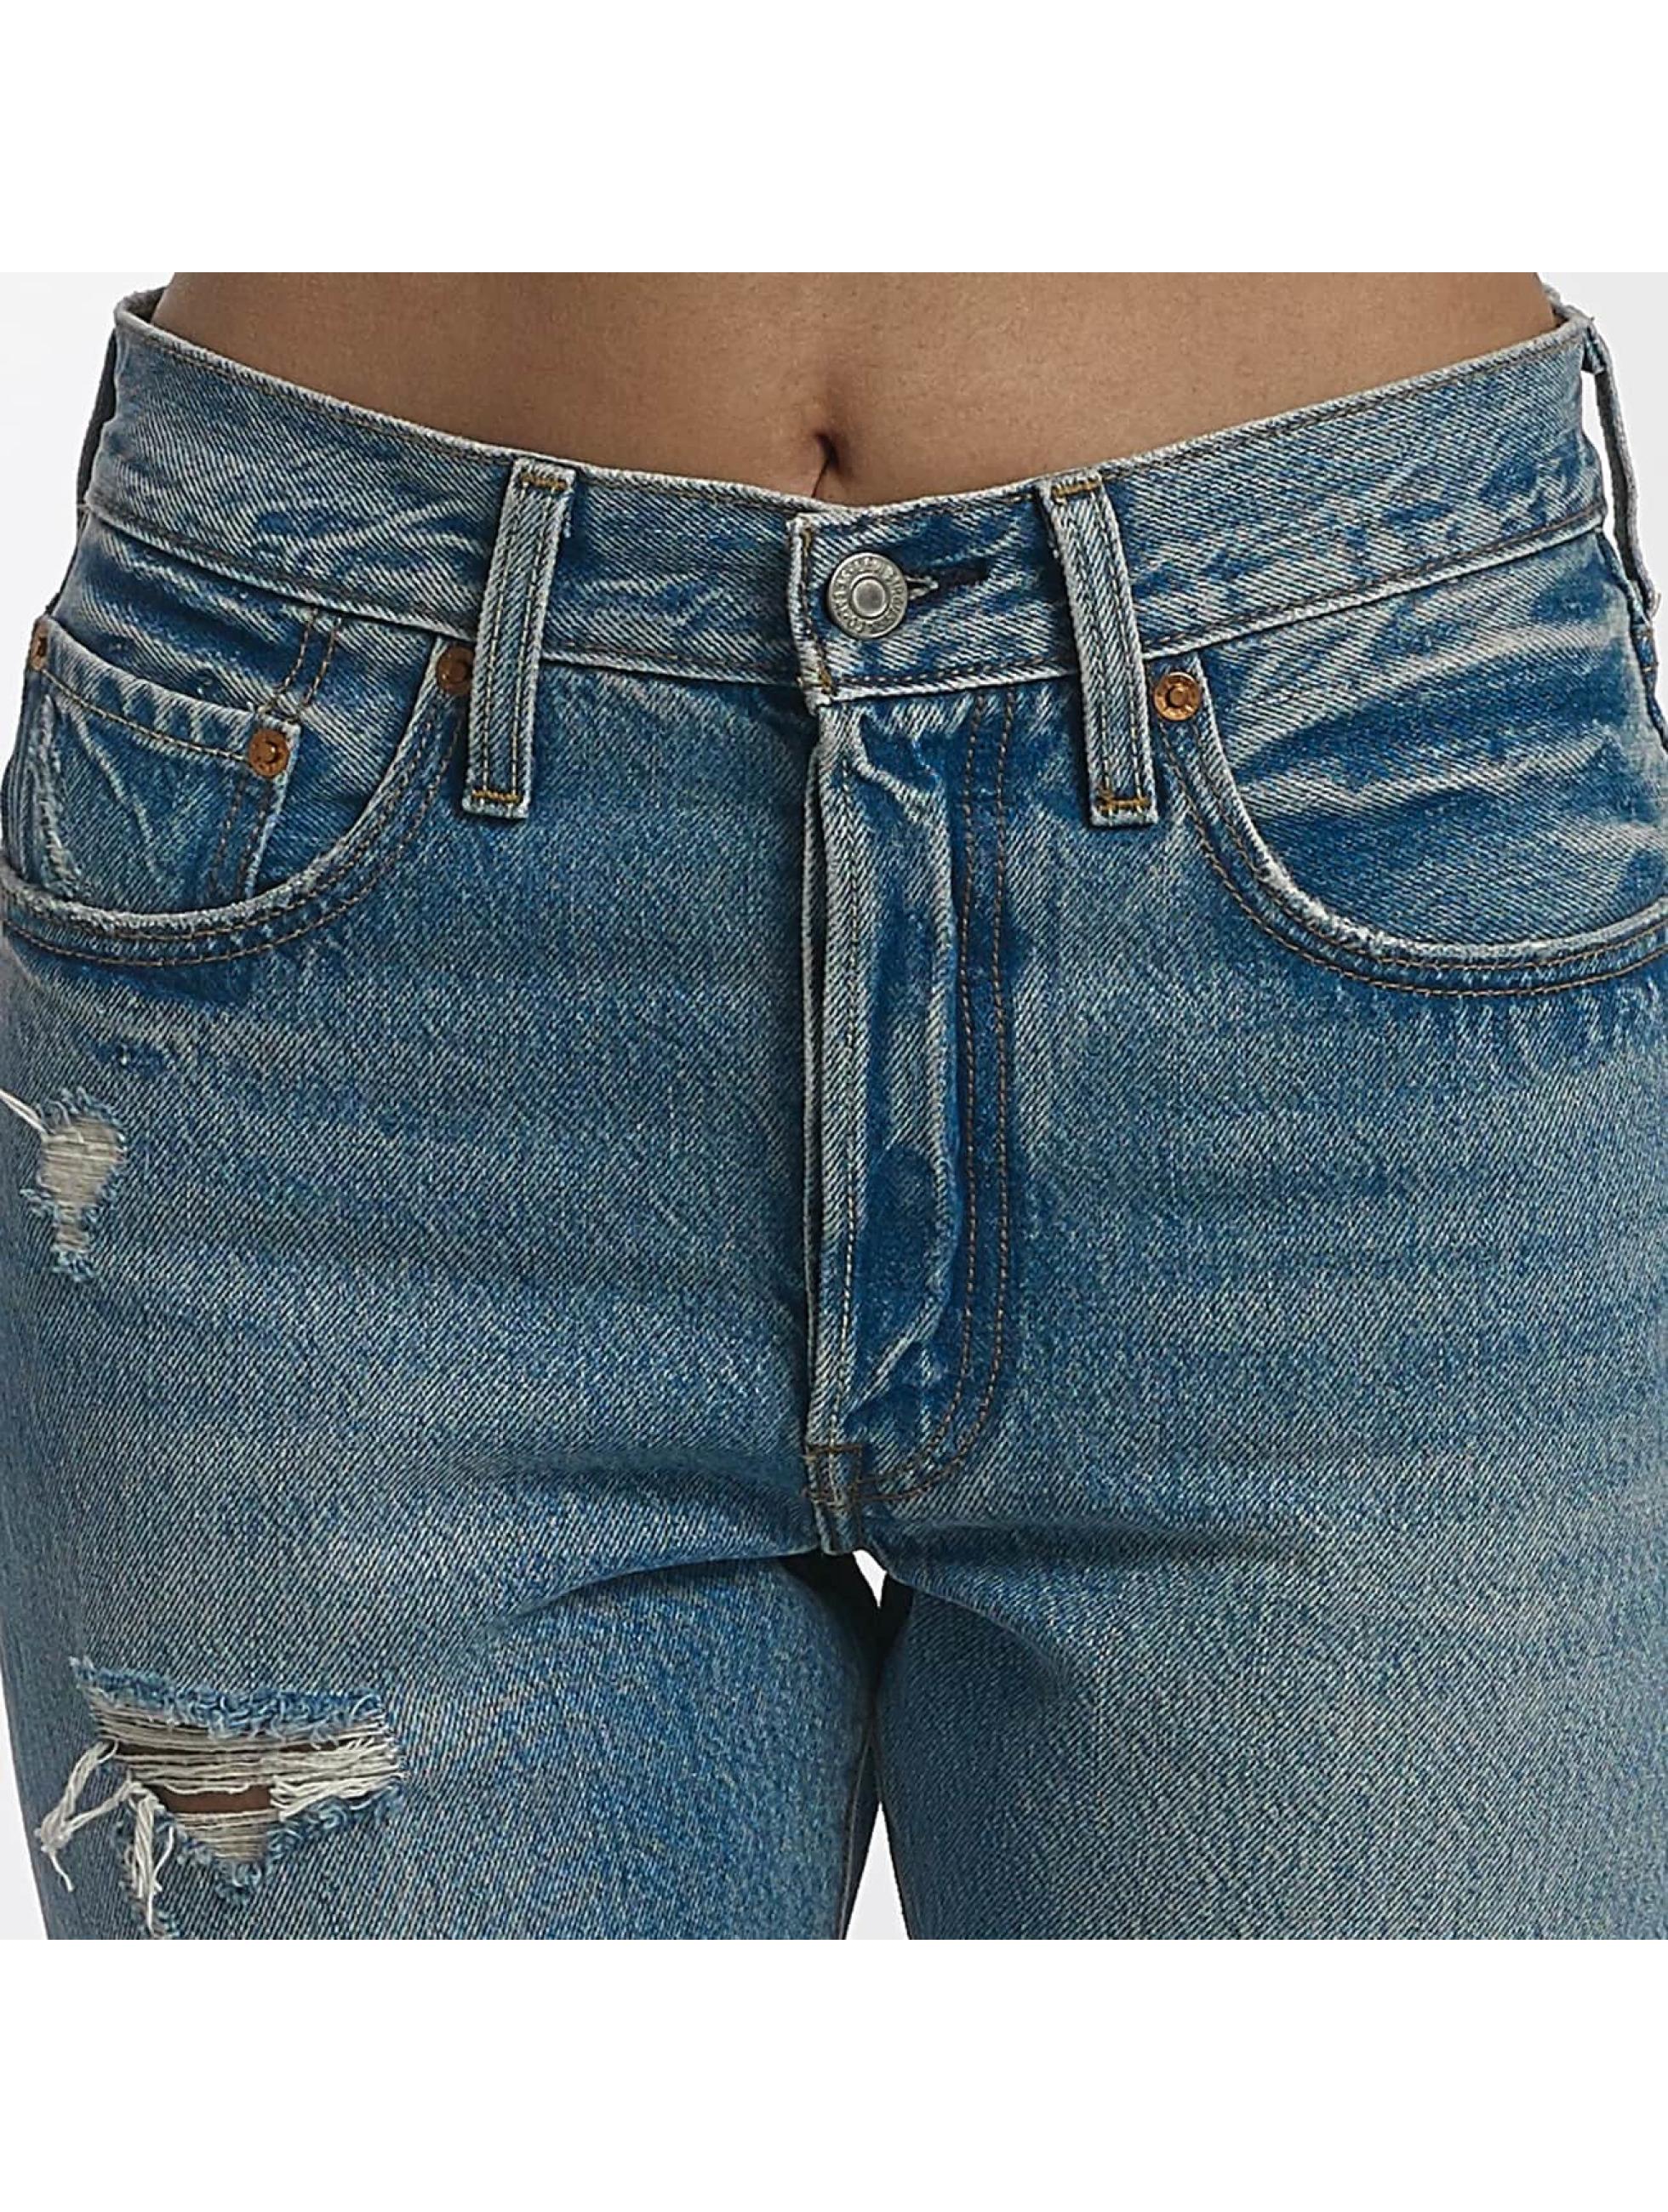 levi 39 s jeans skinny jeans 501 skinny in blauw 437633. Black Bedroom Furniture Sets. Home Design Ideas